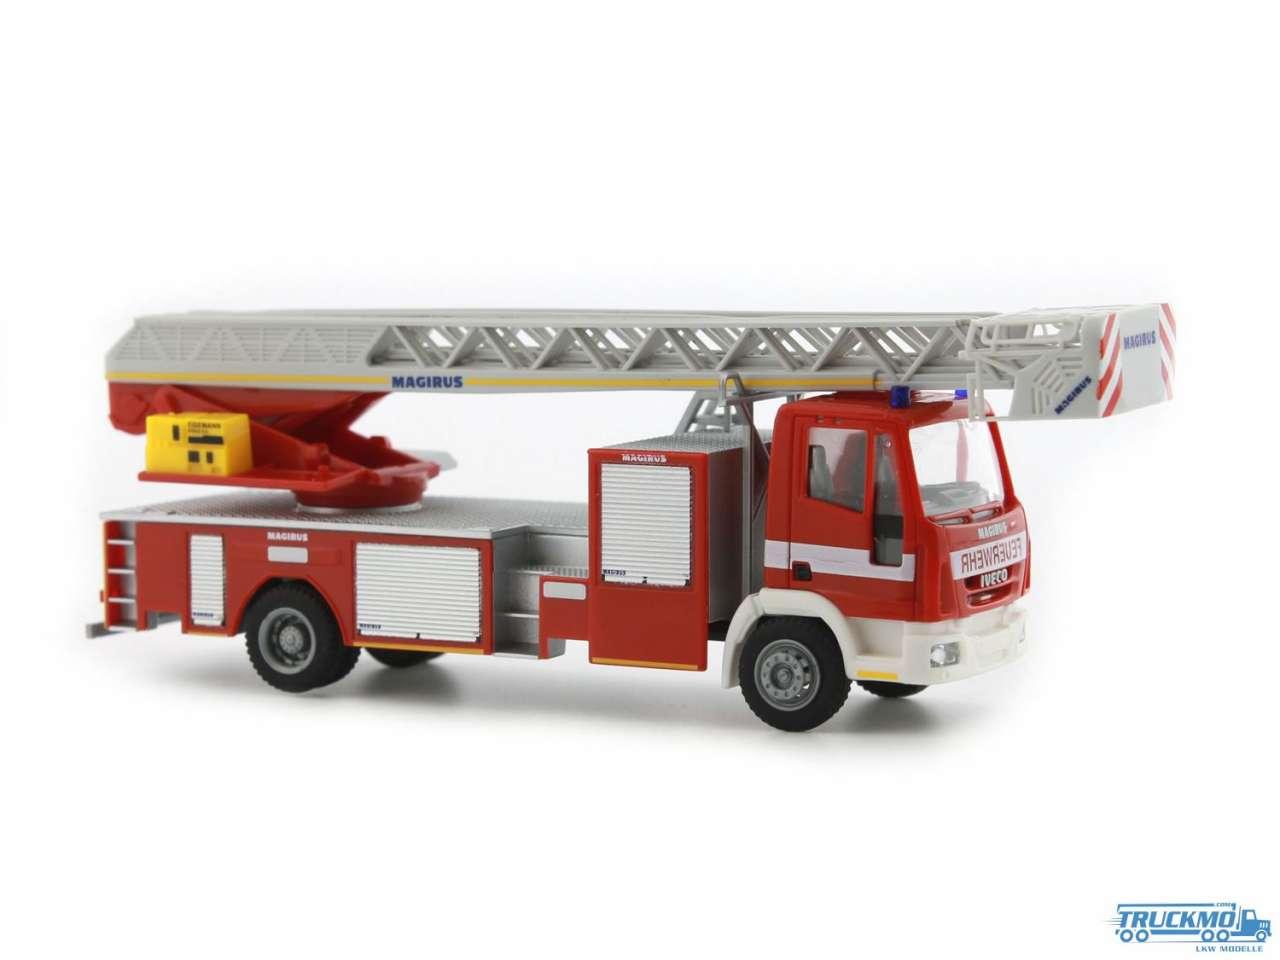 Rietze Feuerwehr Halle/Saale Iveco Magirus DLK 32 L-AS 68552